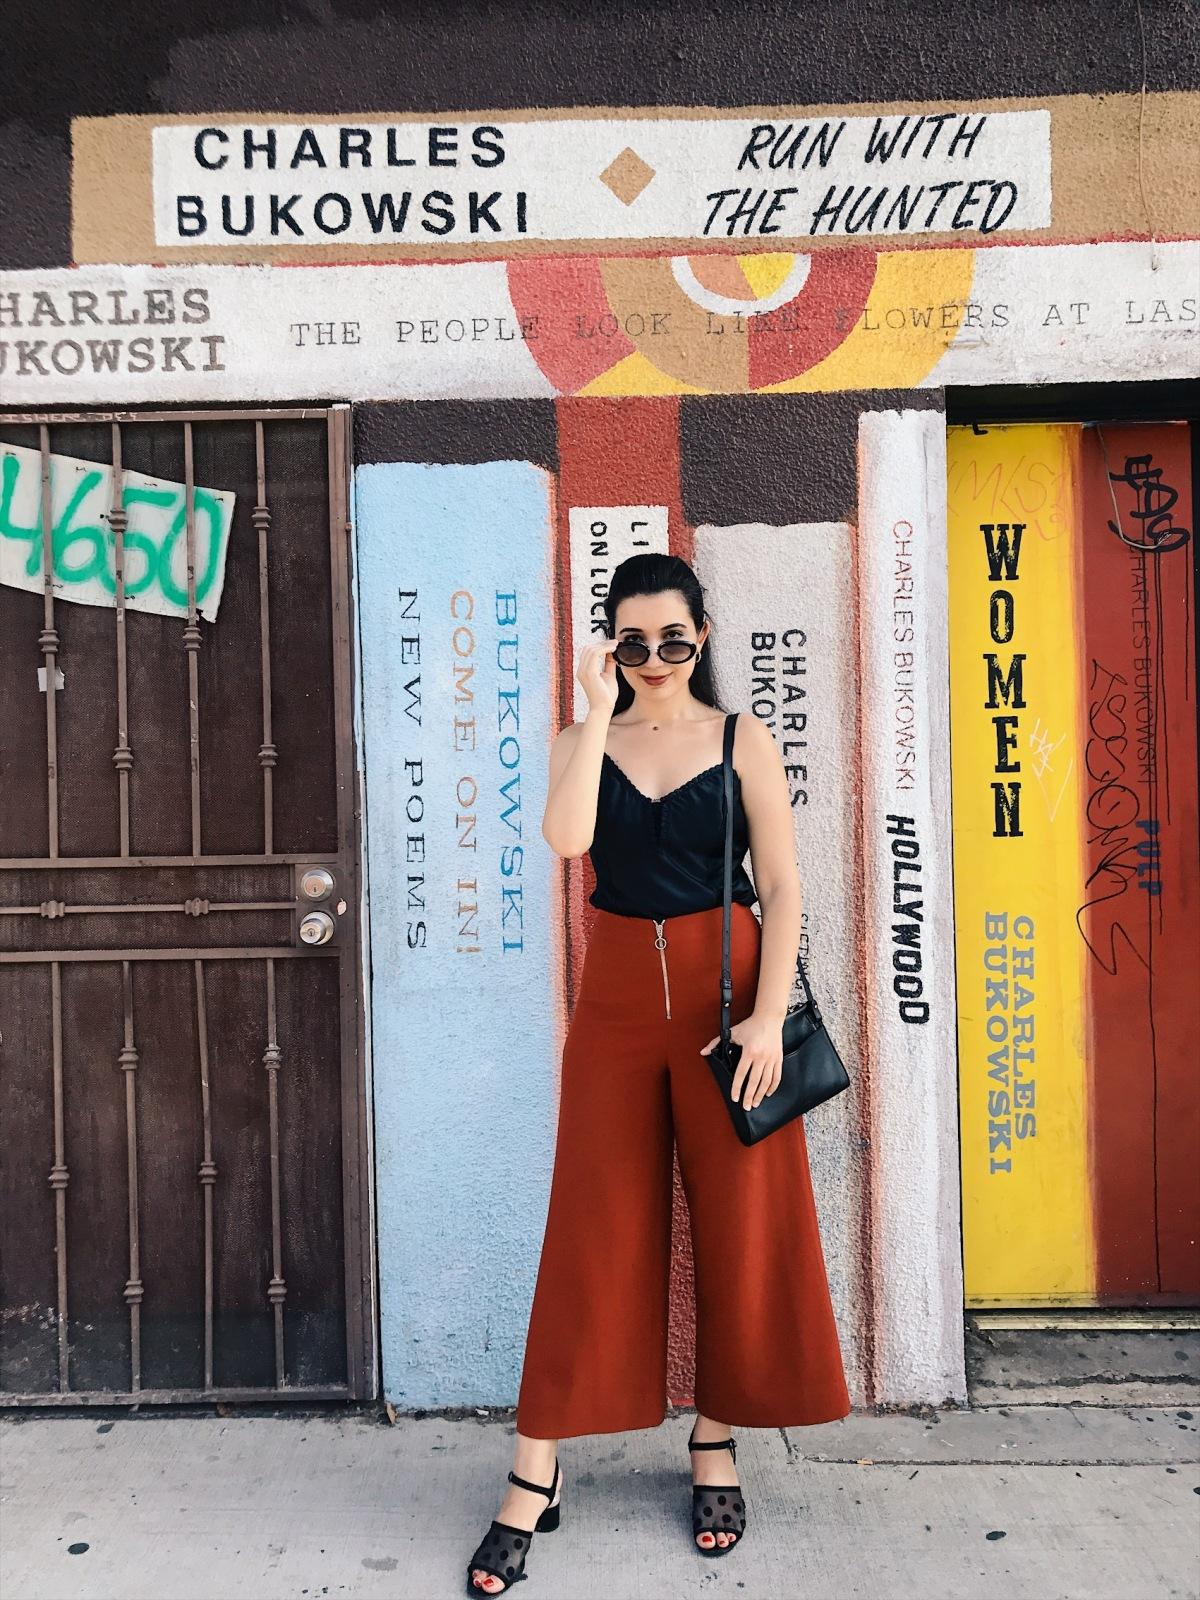 Skylight Books, book wall mural, bookish, Los Angeles books, Zara, culottes, black tank top, vintage fashion, fashion blogger, style blogger, book blogger